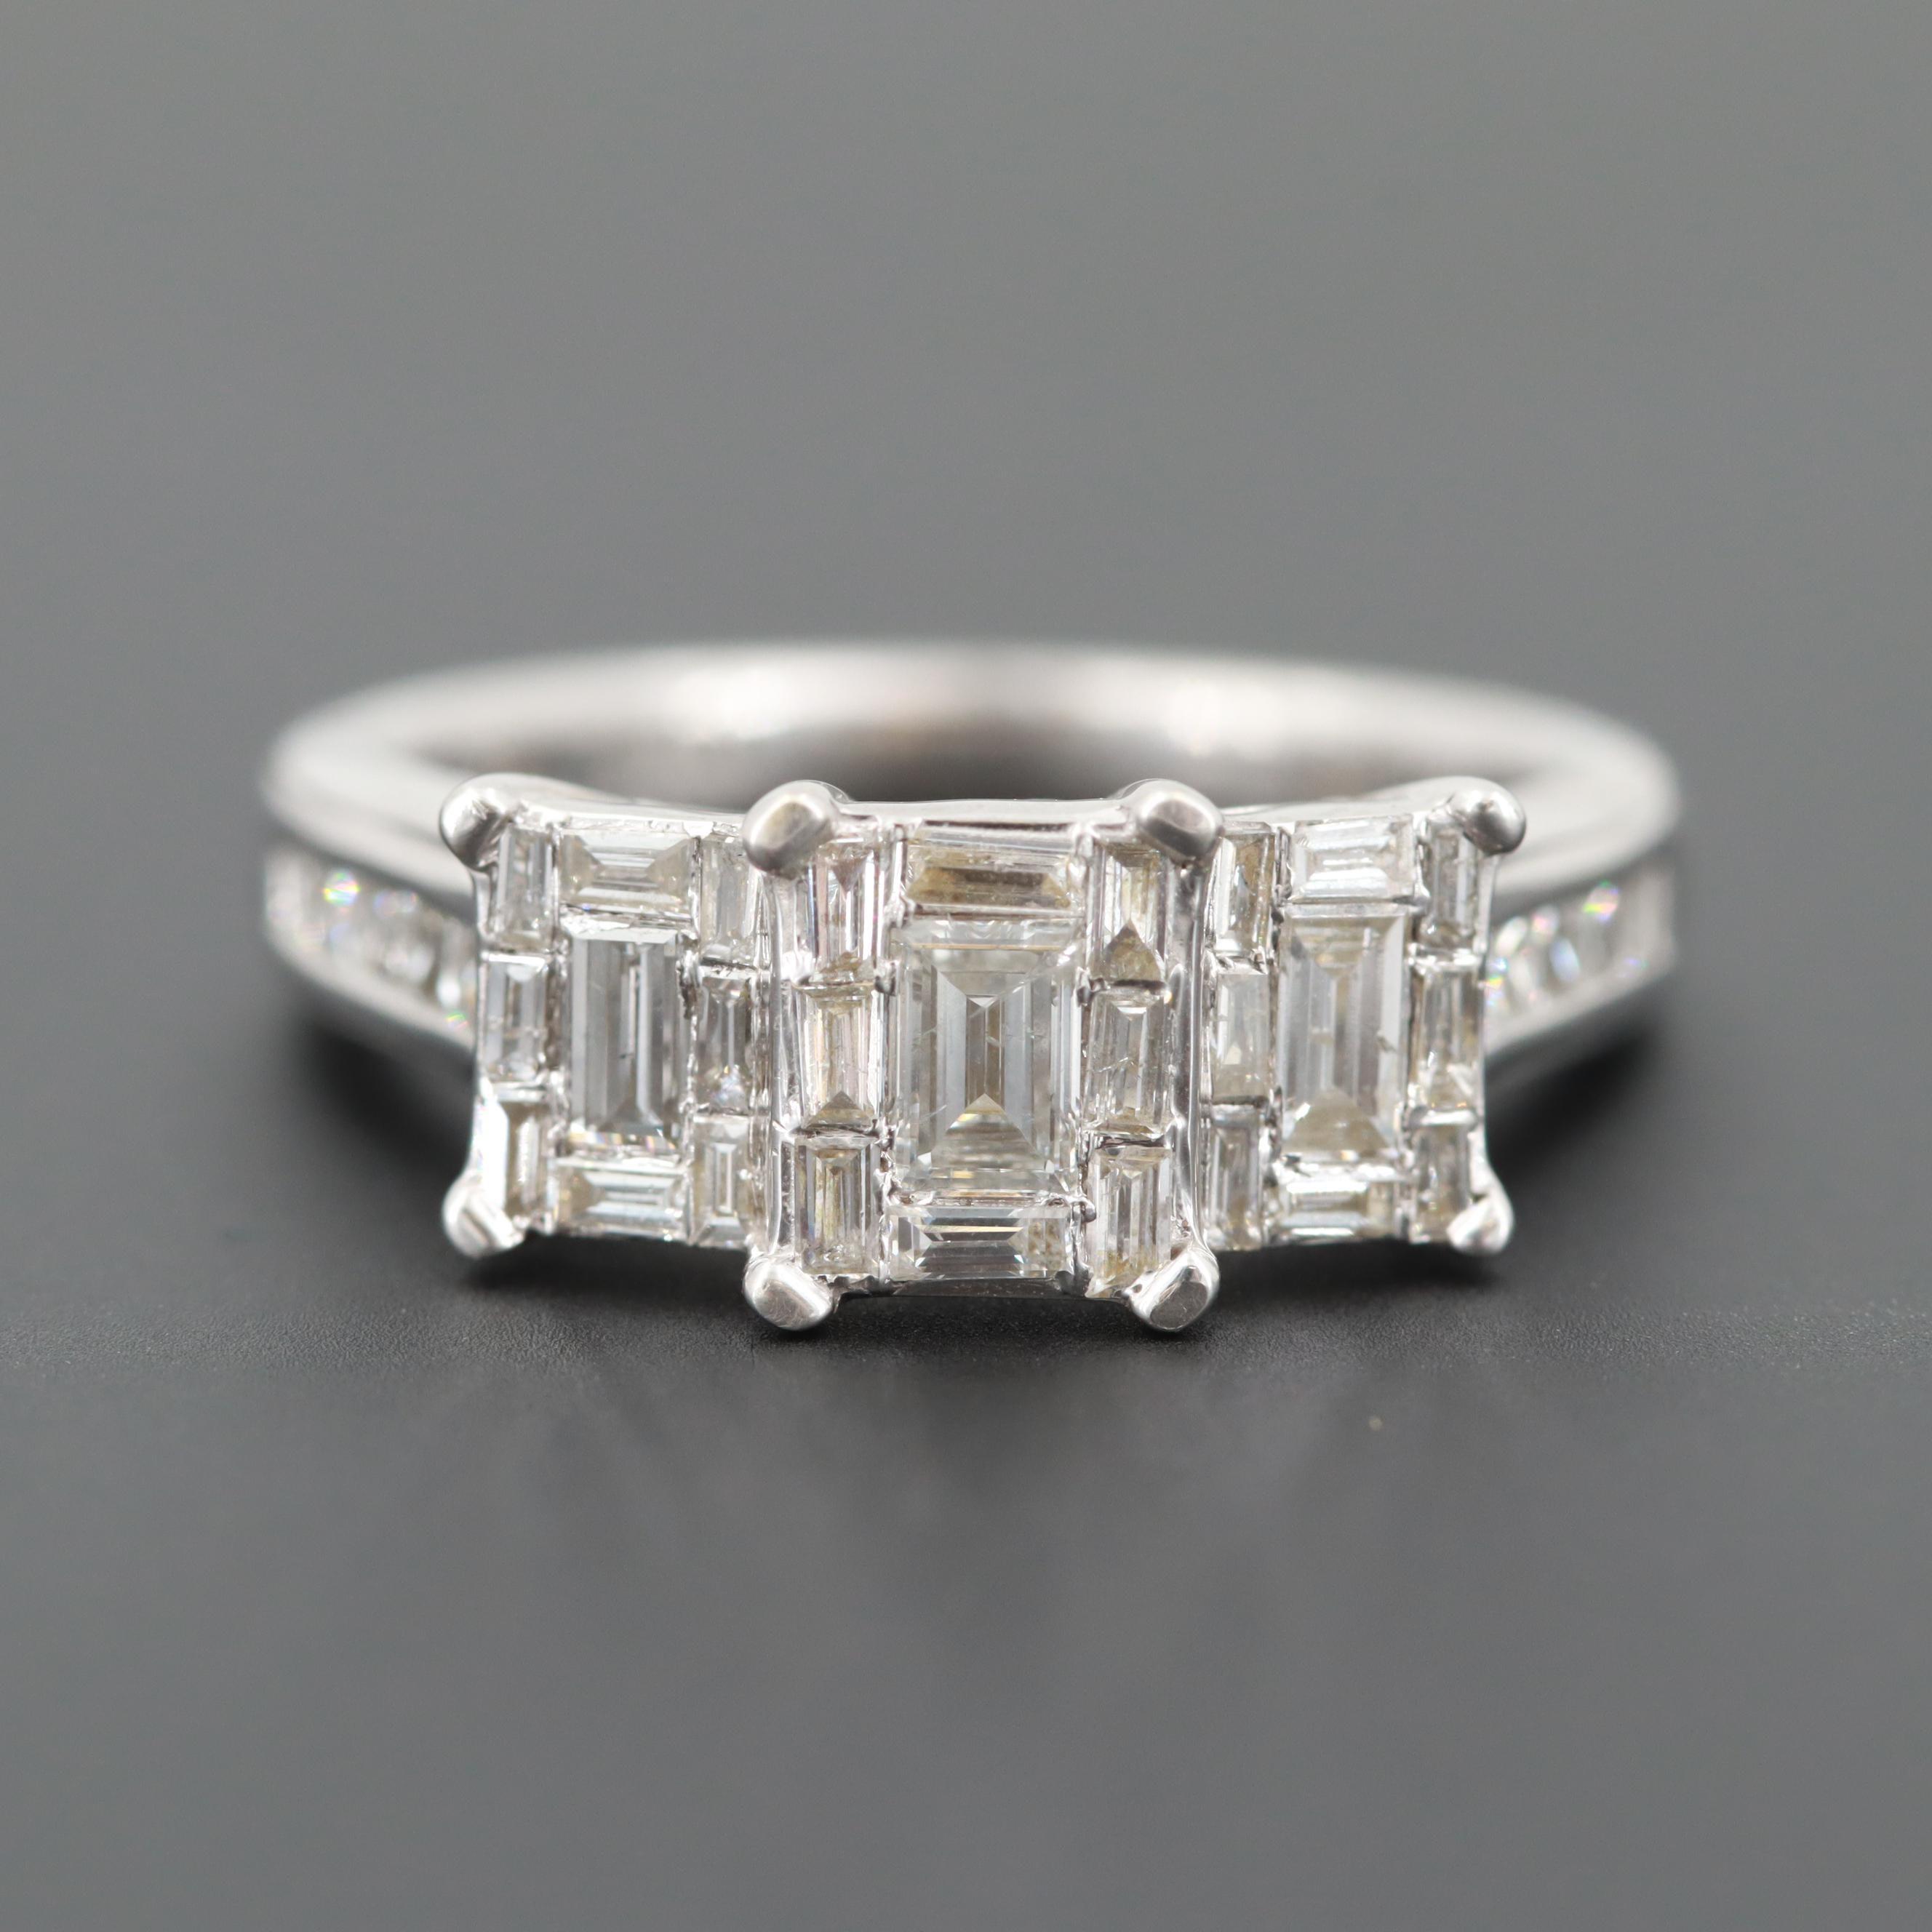 Harmony Eternally in Love 14K White Gold 1.02 CTW Diamond Ring